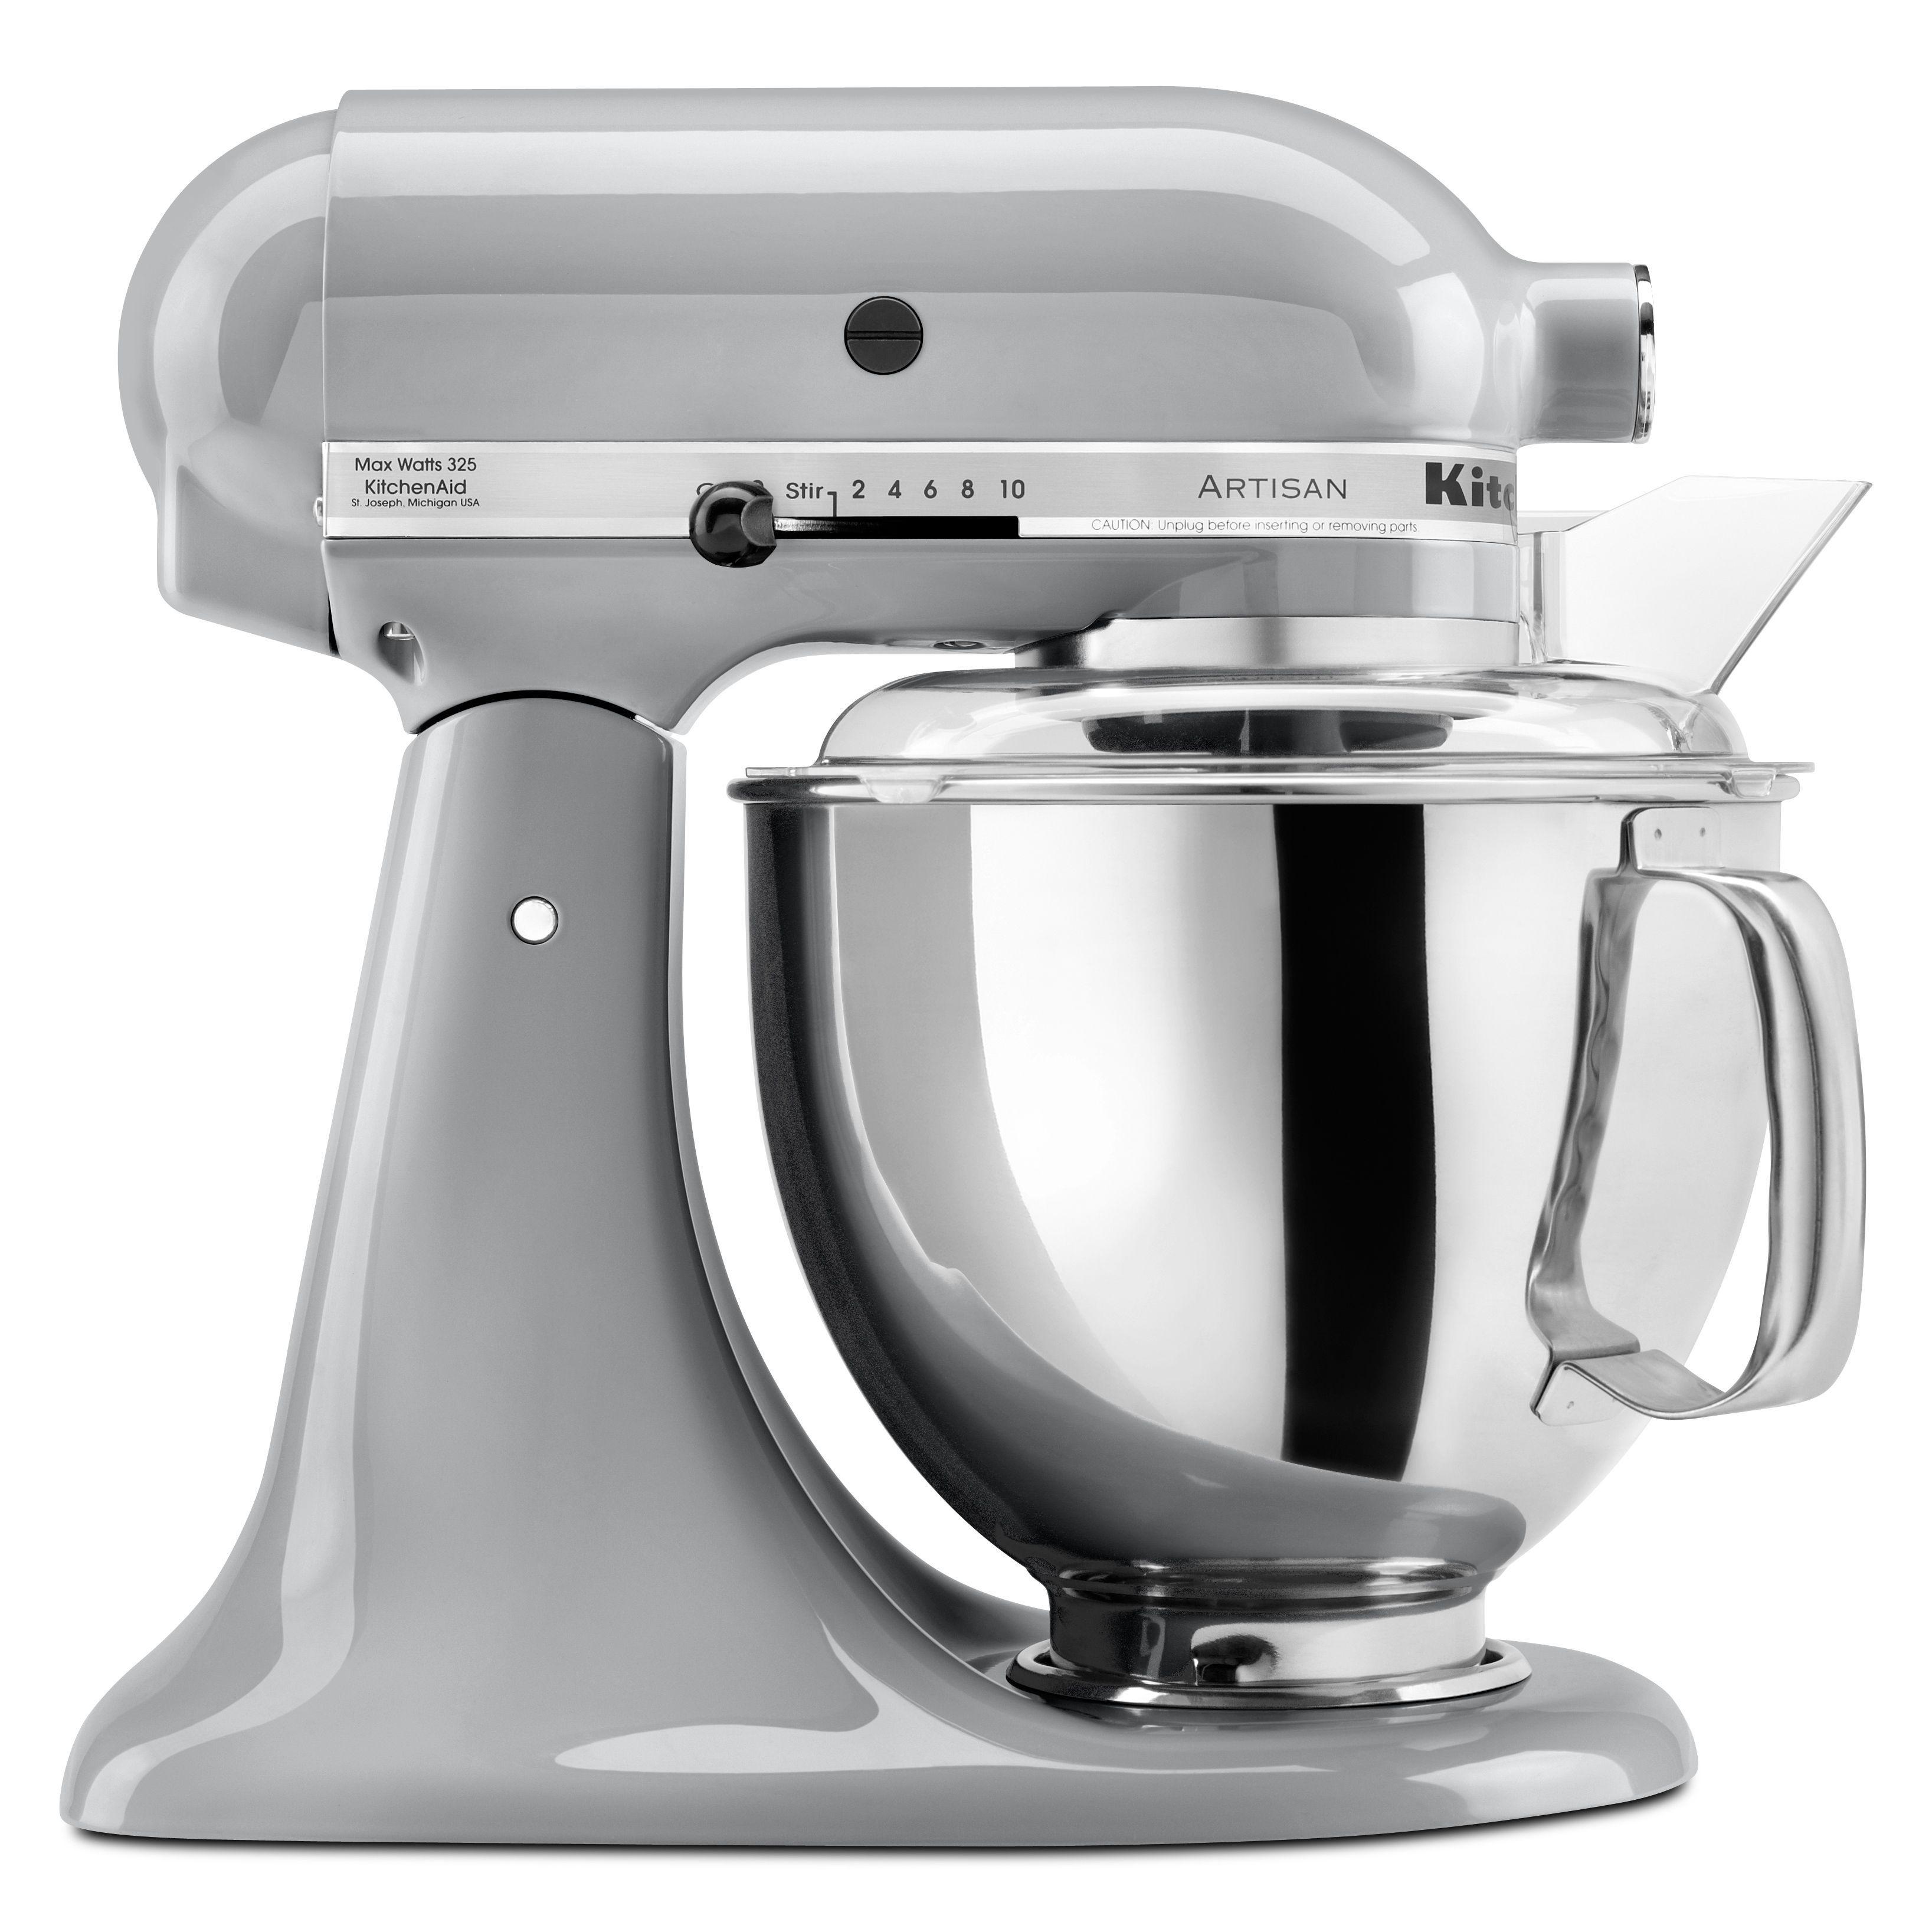 stand protrade kitchen series international quart mixer shop artisan kitchenaid head aid tilt